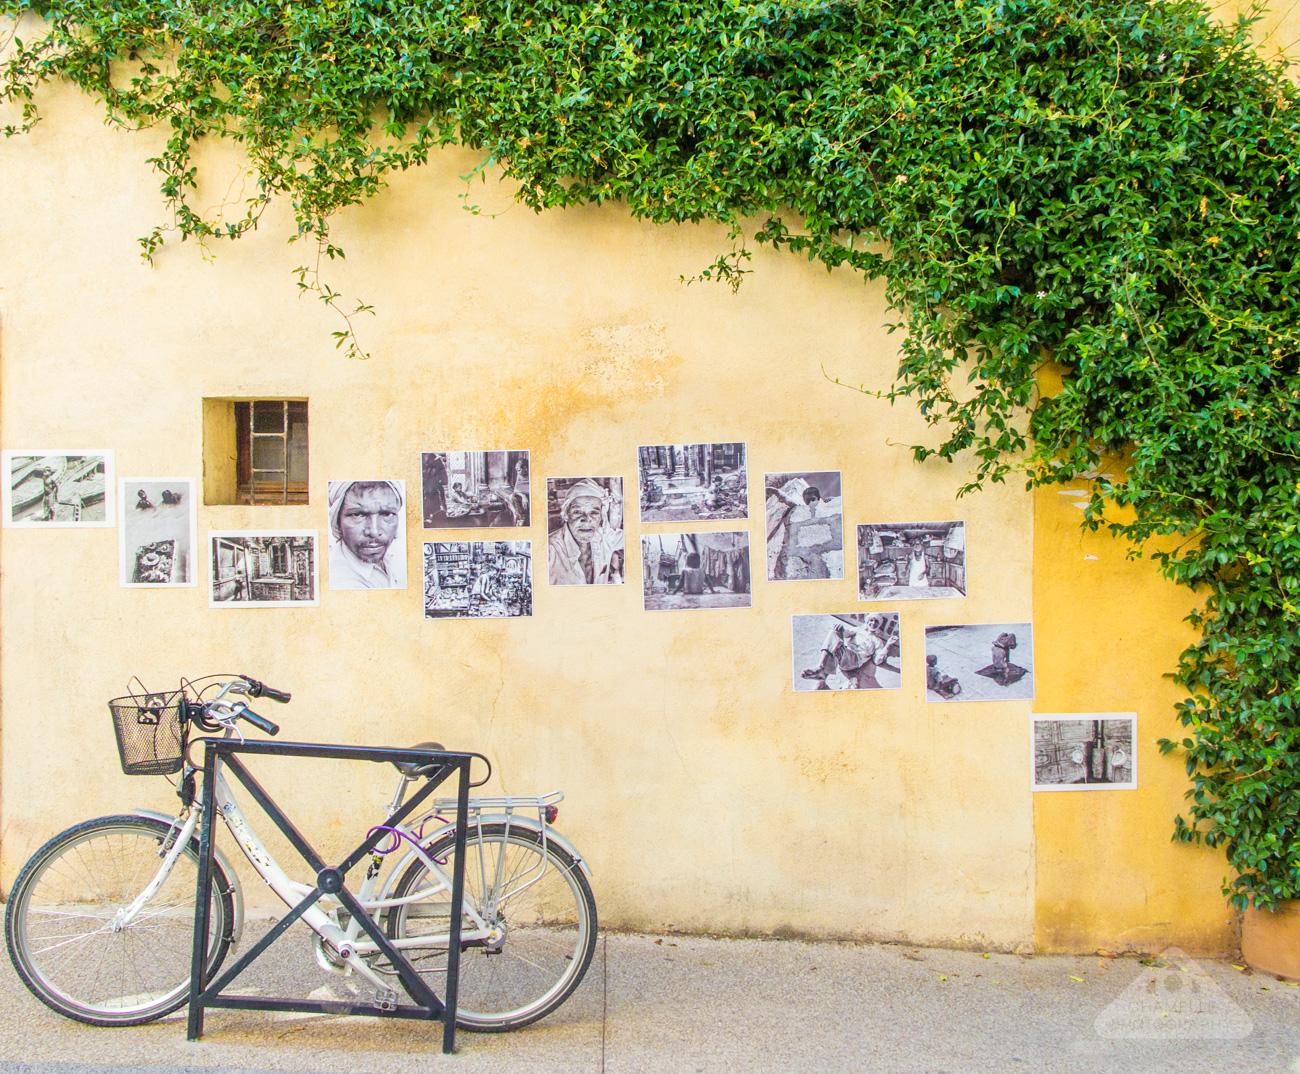 Van Gogh trail Rencontres d'Arles France travel blog